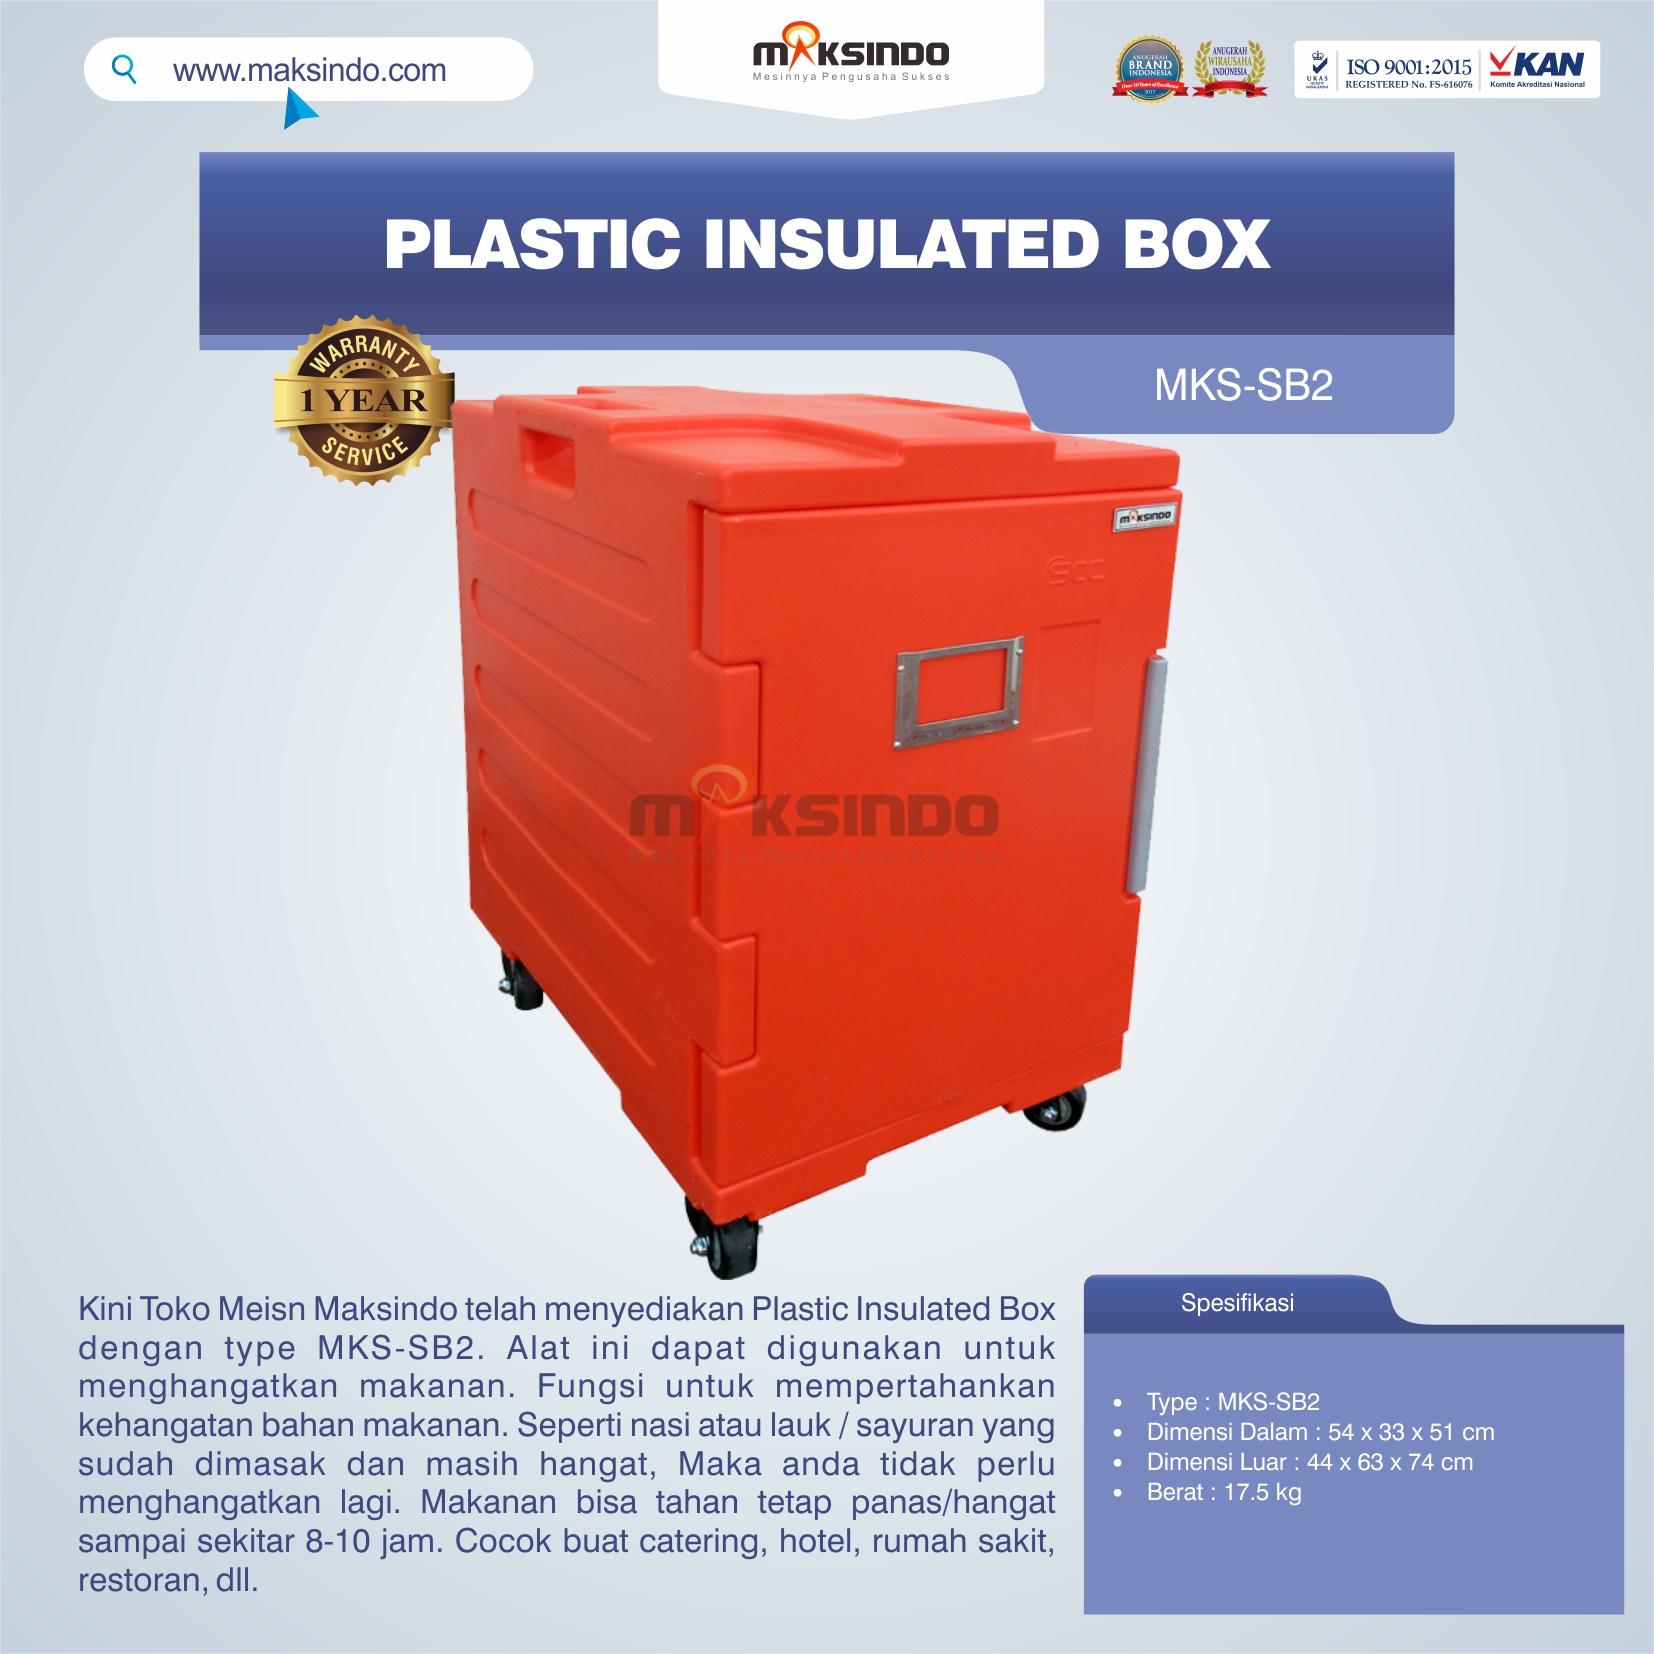 Jual Plastic Insulated Box MKS-SB2 di Mataram